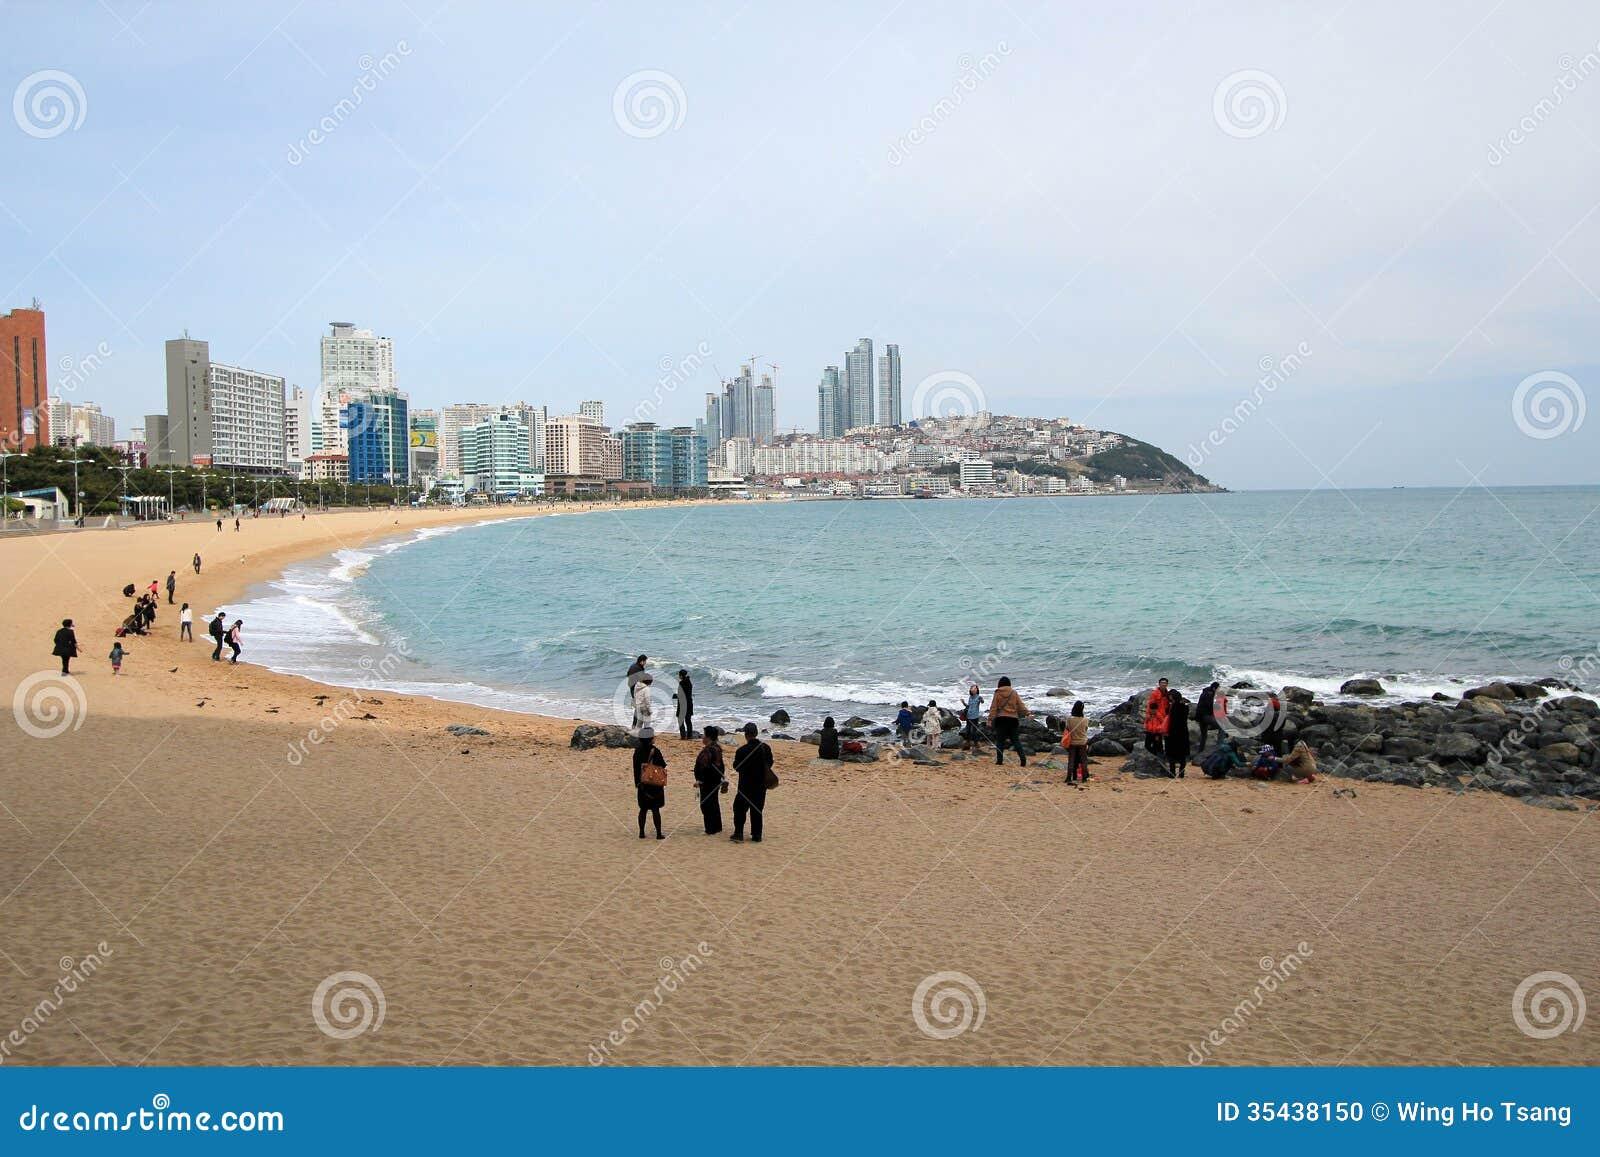 Sea, beach, body, of, water, coastal, and, oceanic, landforms, coast, shore, sky, ocean, sand, tourism, horizon, vacation, city, b